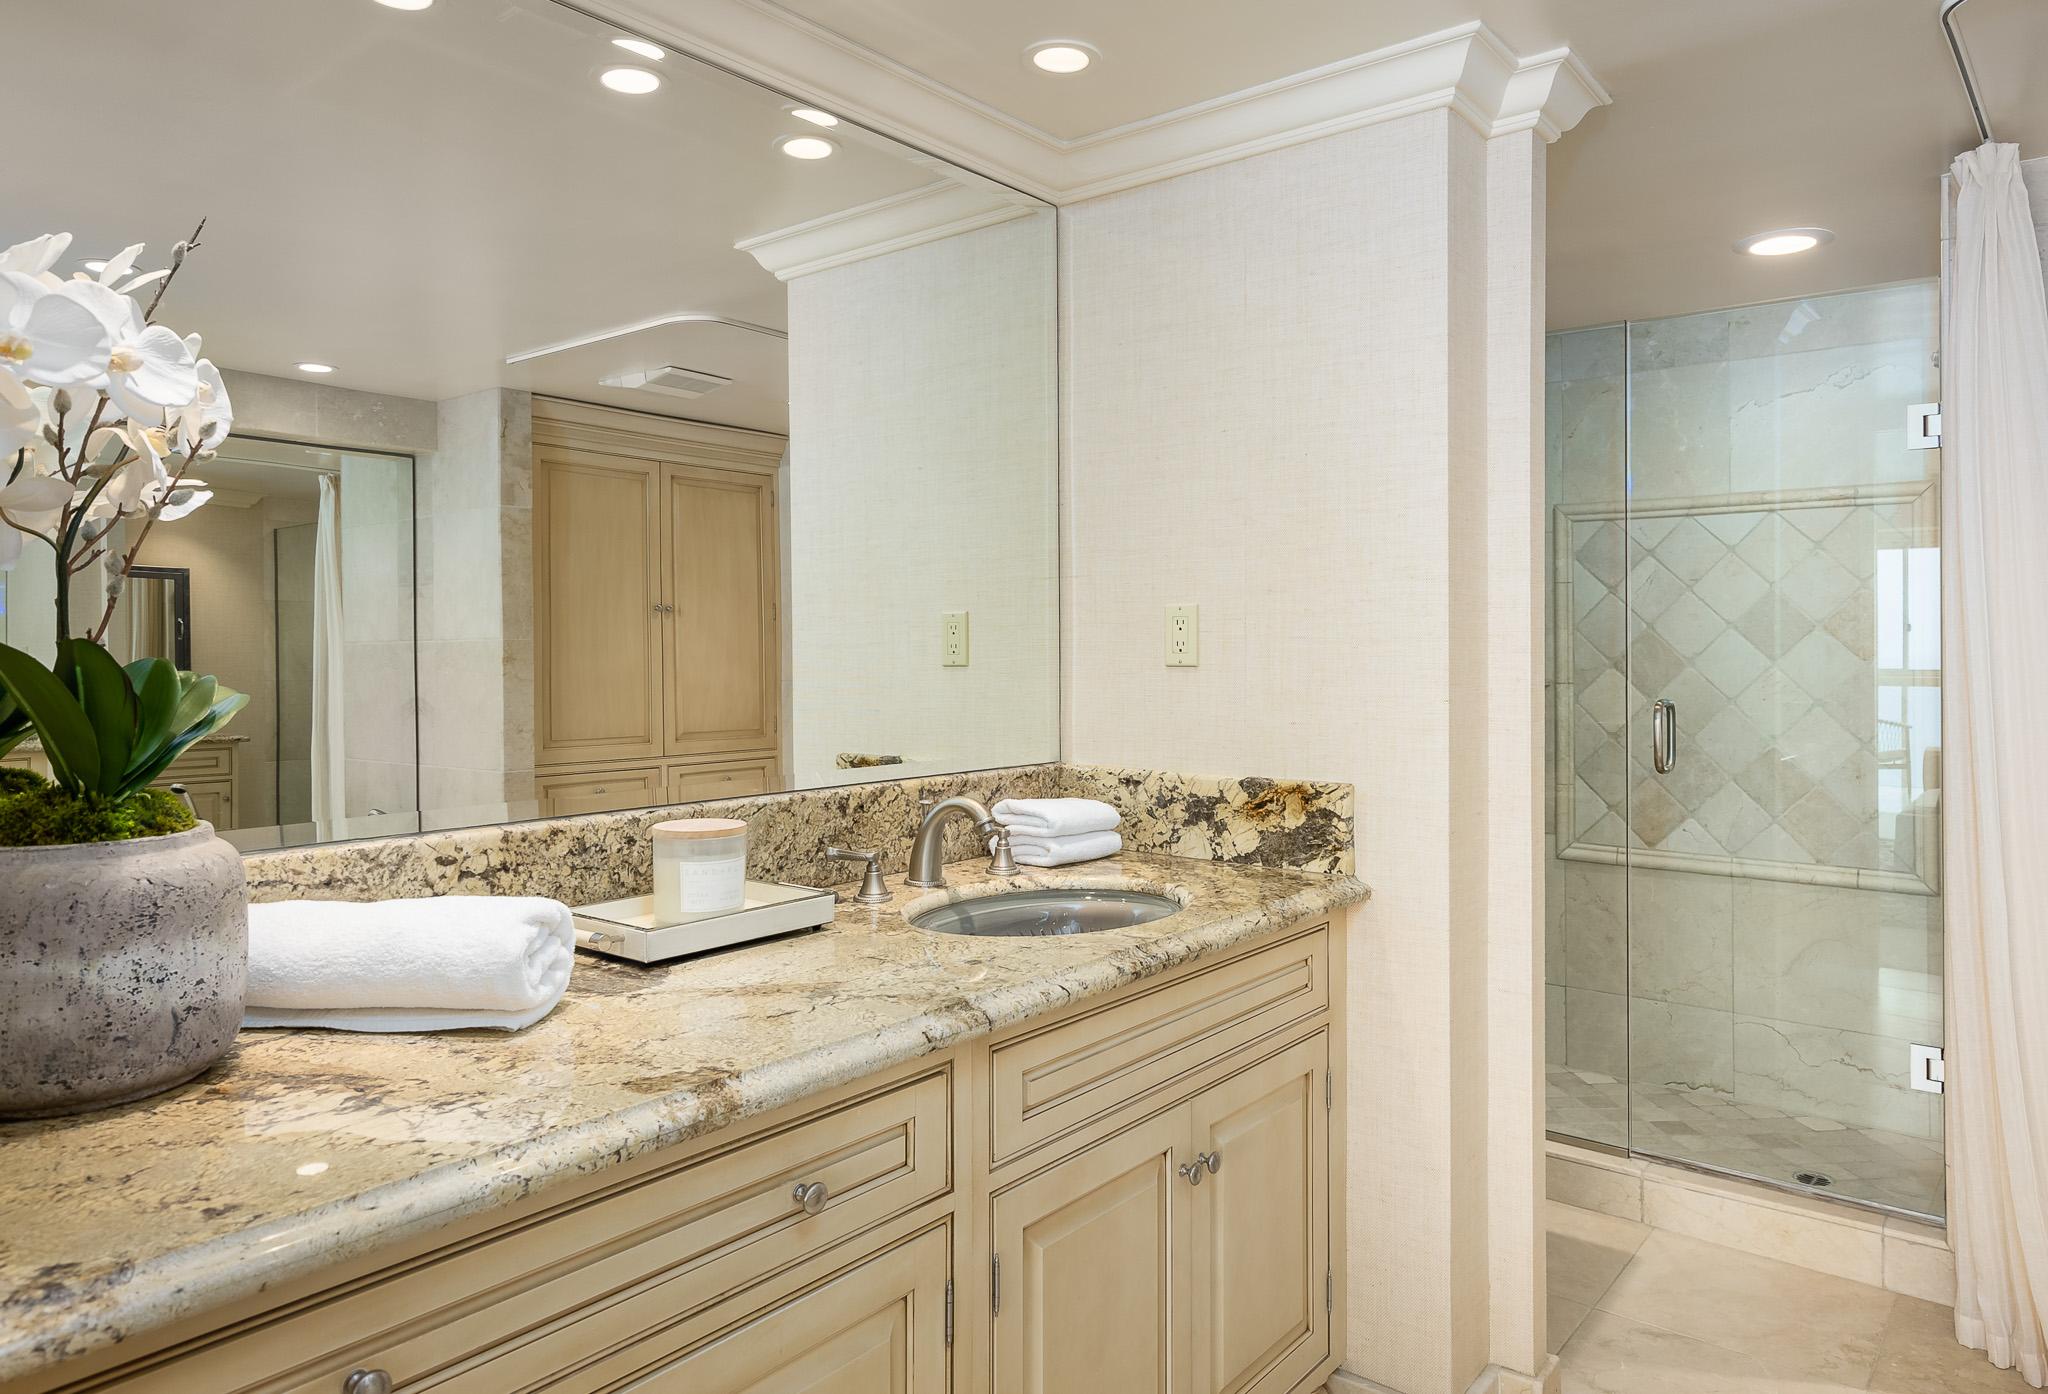 Sold 2021 Represented Buyer & Seller -  La Jolla, CA 92037